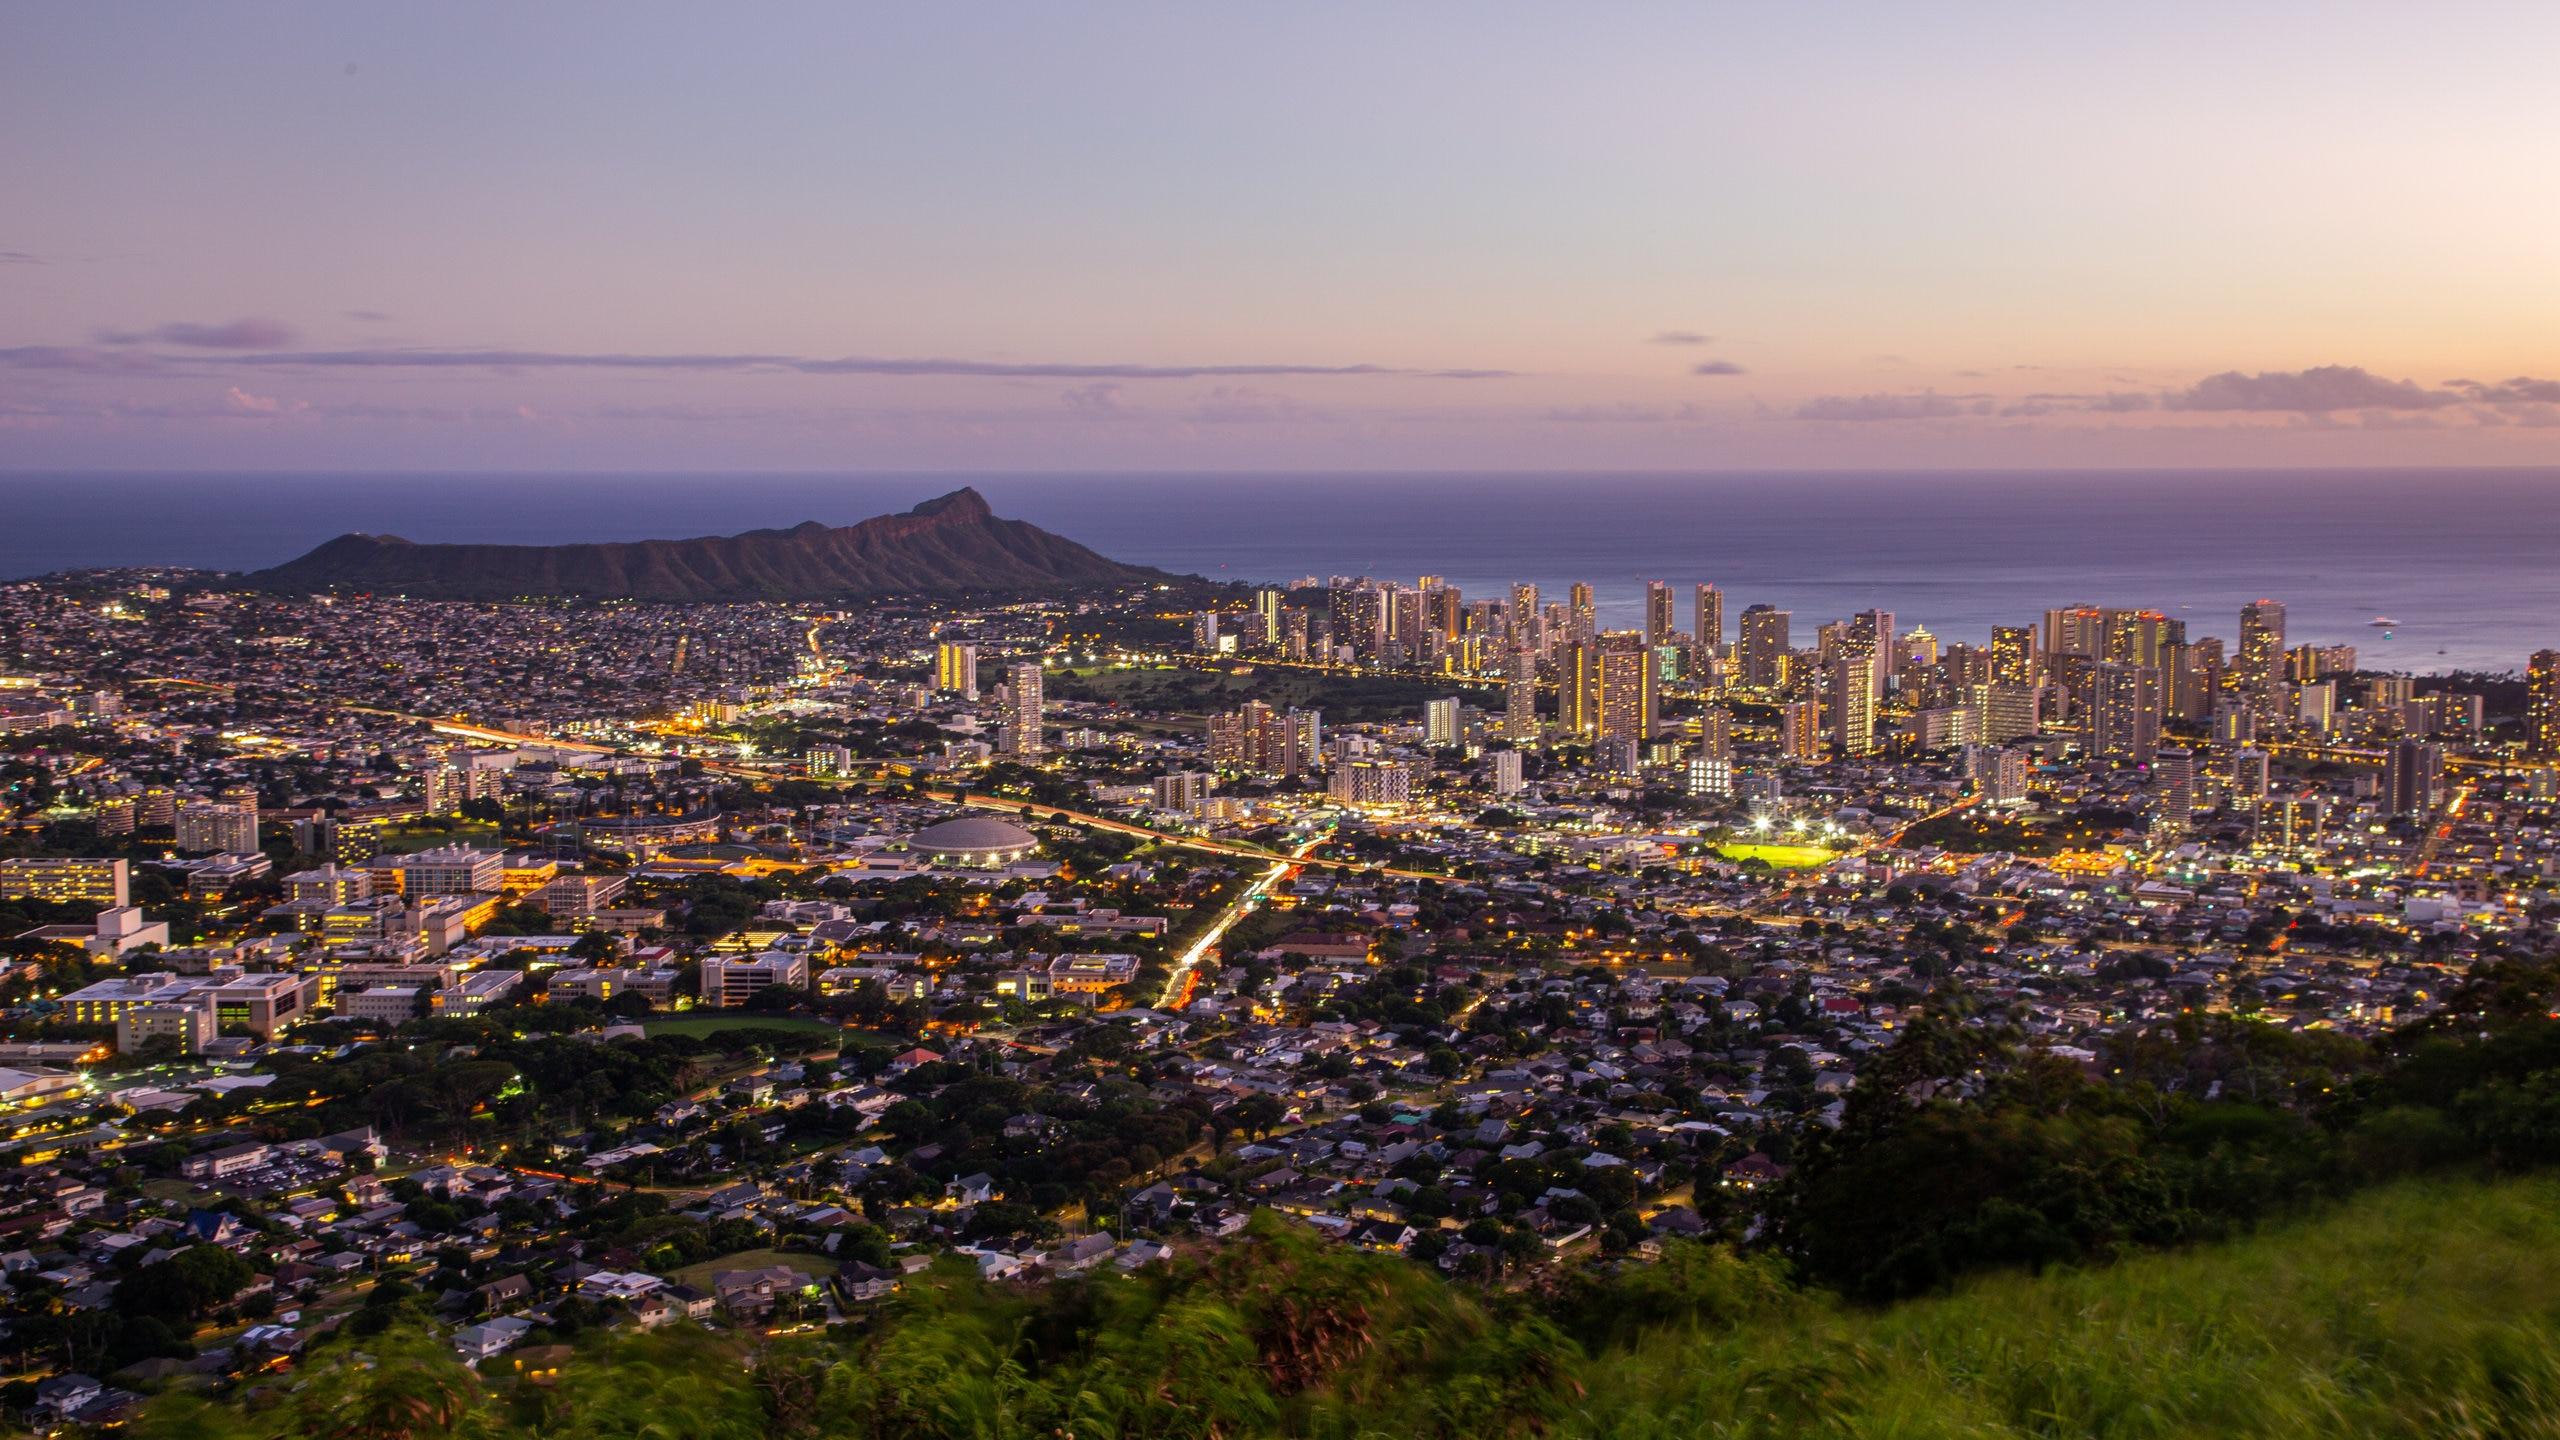 Waikiki, Honolulu, Hawaii, United States of America